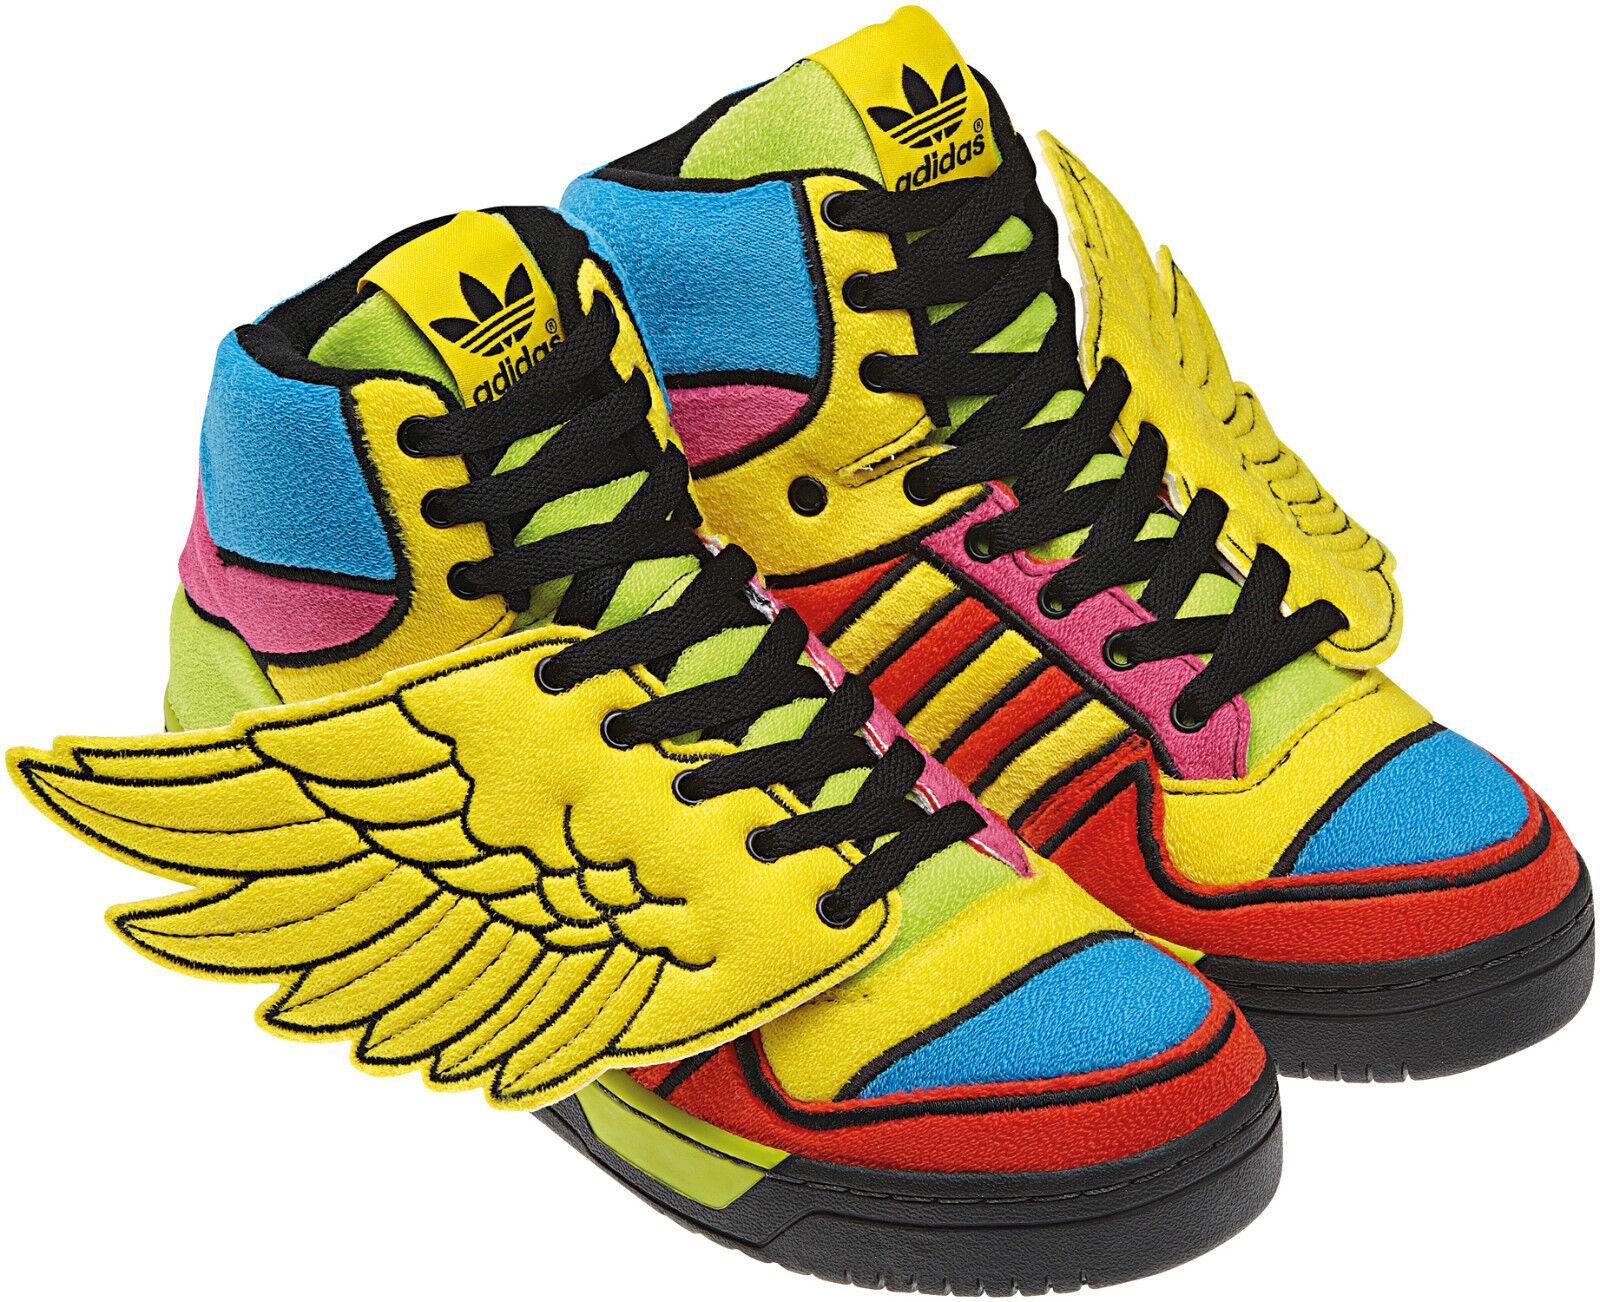 RAREAdidas JEREMY SCOTT WINGS JS OBYO Sneakers CHENILLE shoes teddyMens size 8